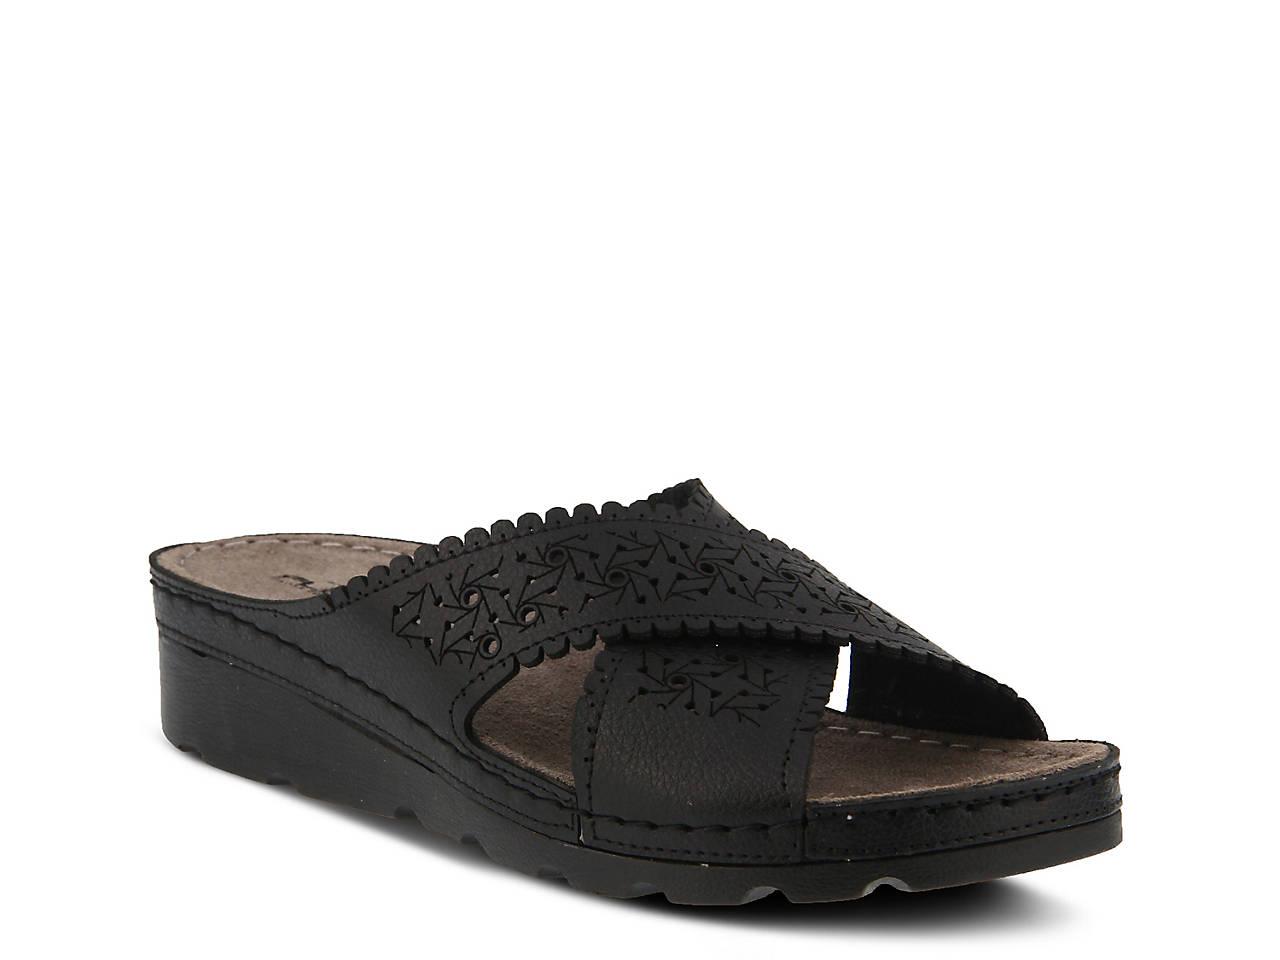 4ddba4cf0826 Flexus by Spring Step Passat Wedge Sandal Women s Shoes